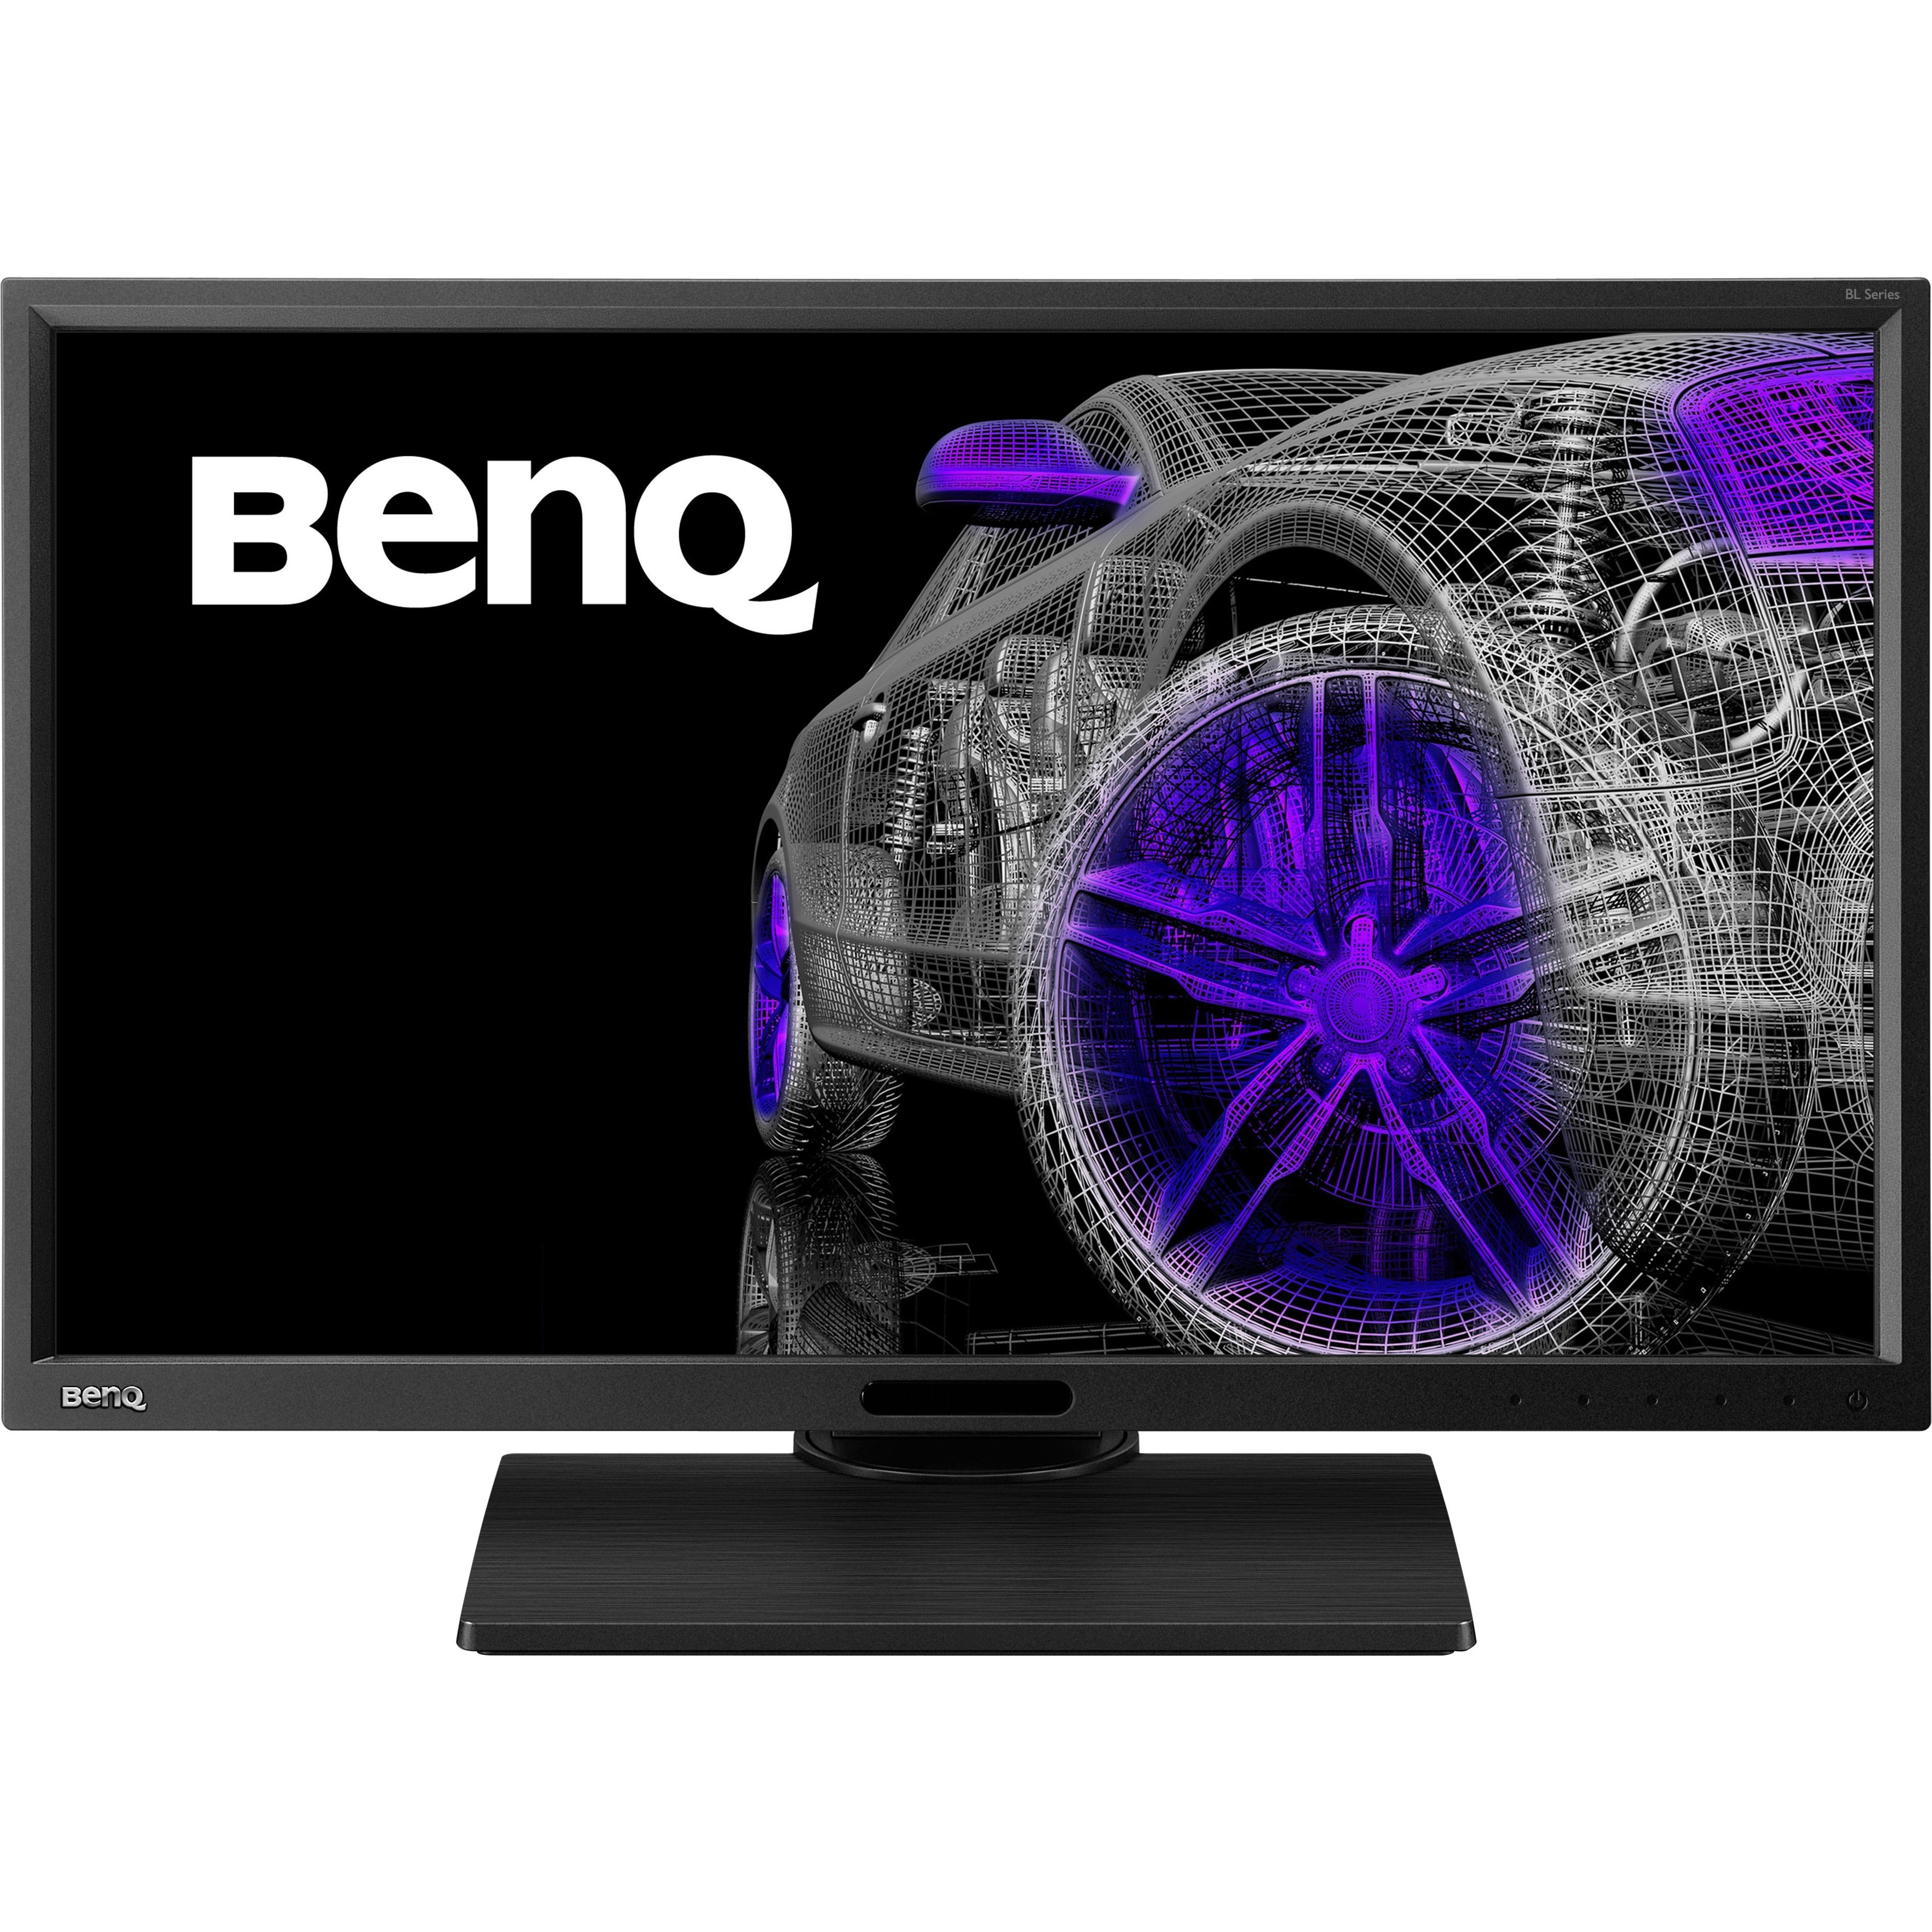 BenQ BL2420PT 23.8inch LED Monitor - 16:9 - 5 ms